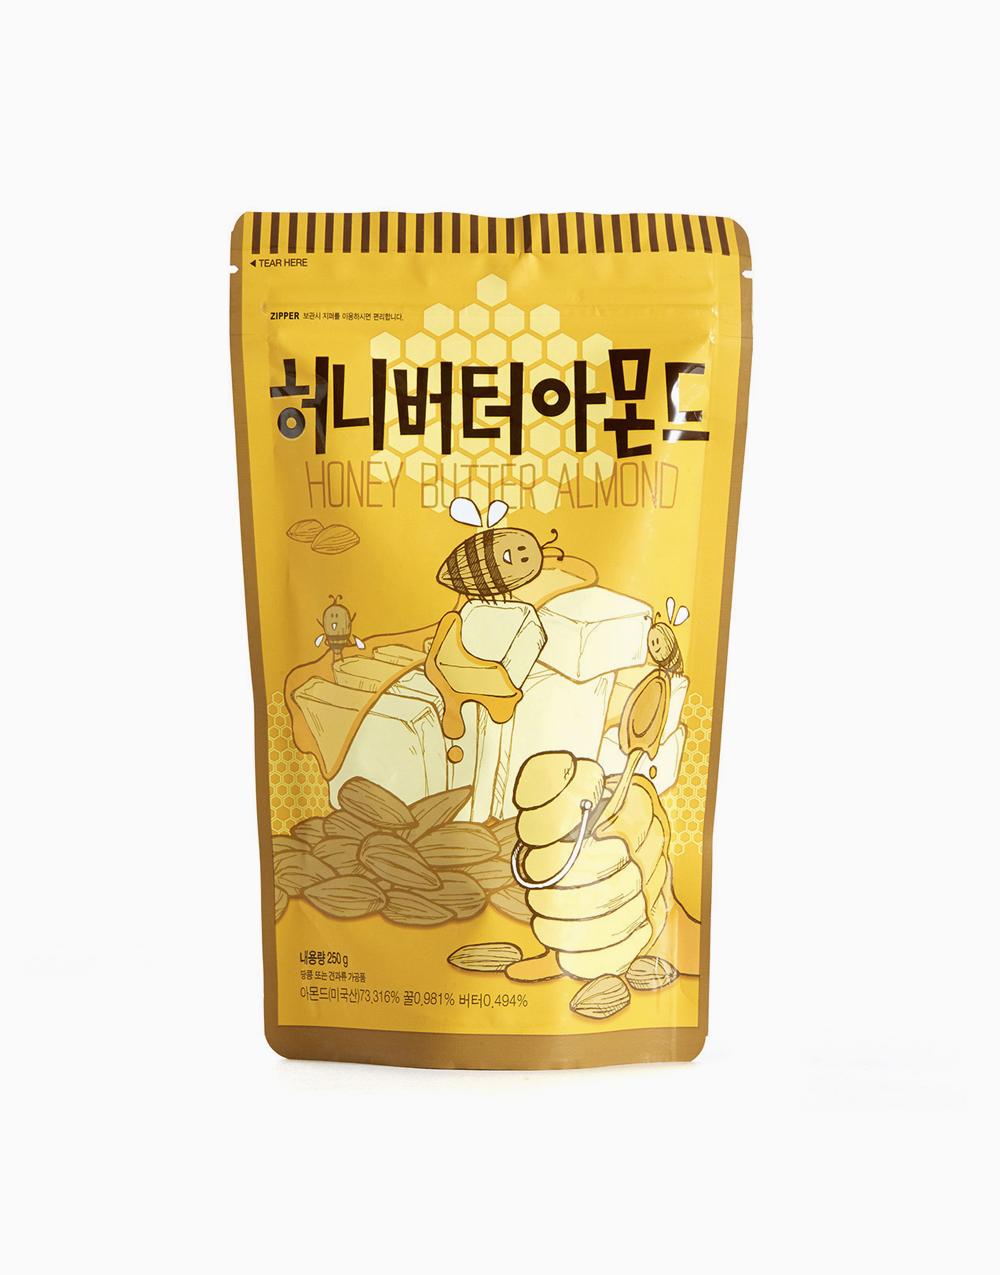 Honey Butter Almond by Tom's Farm Gilim